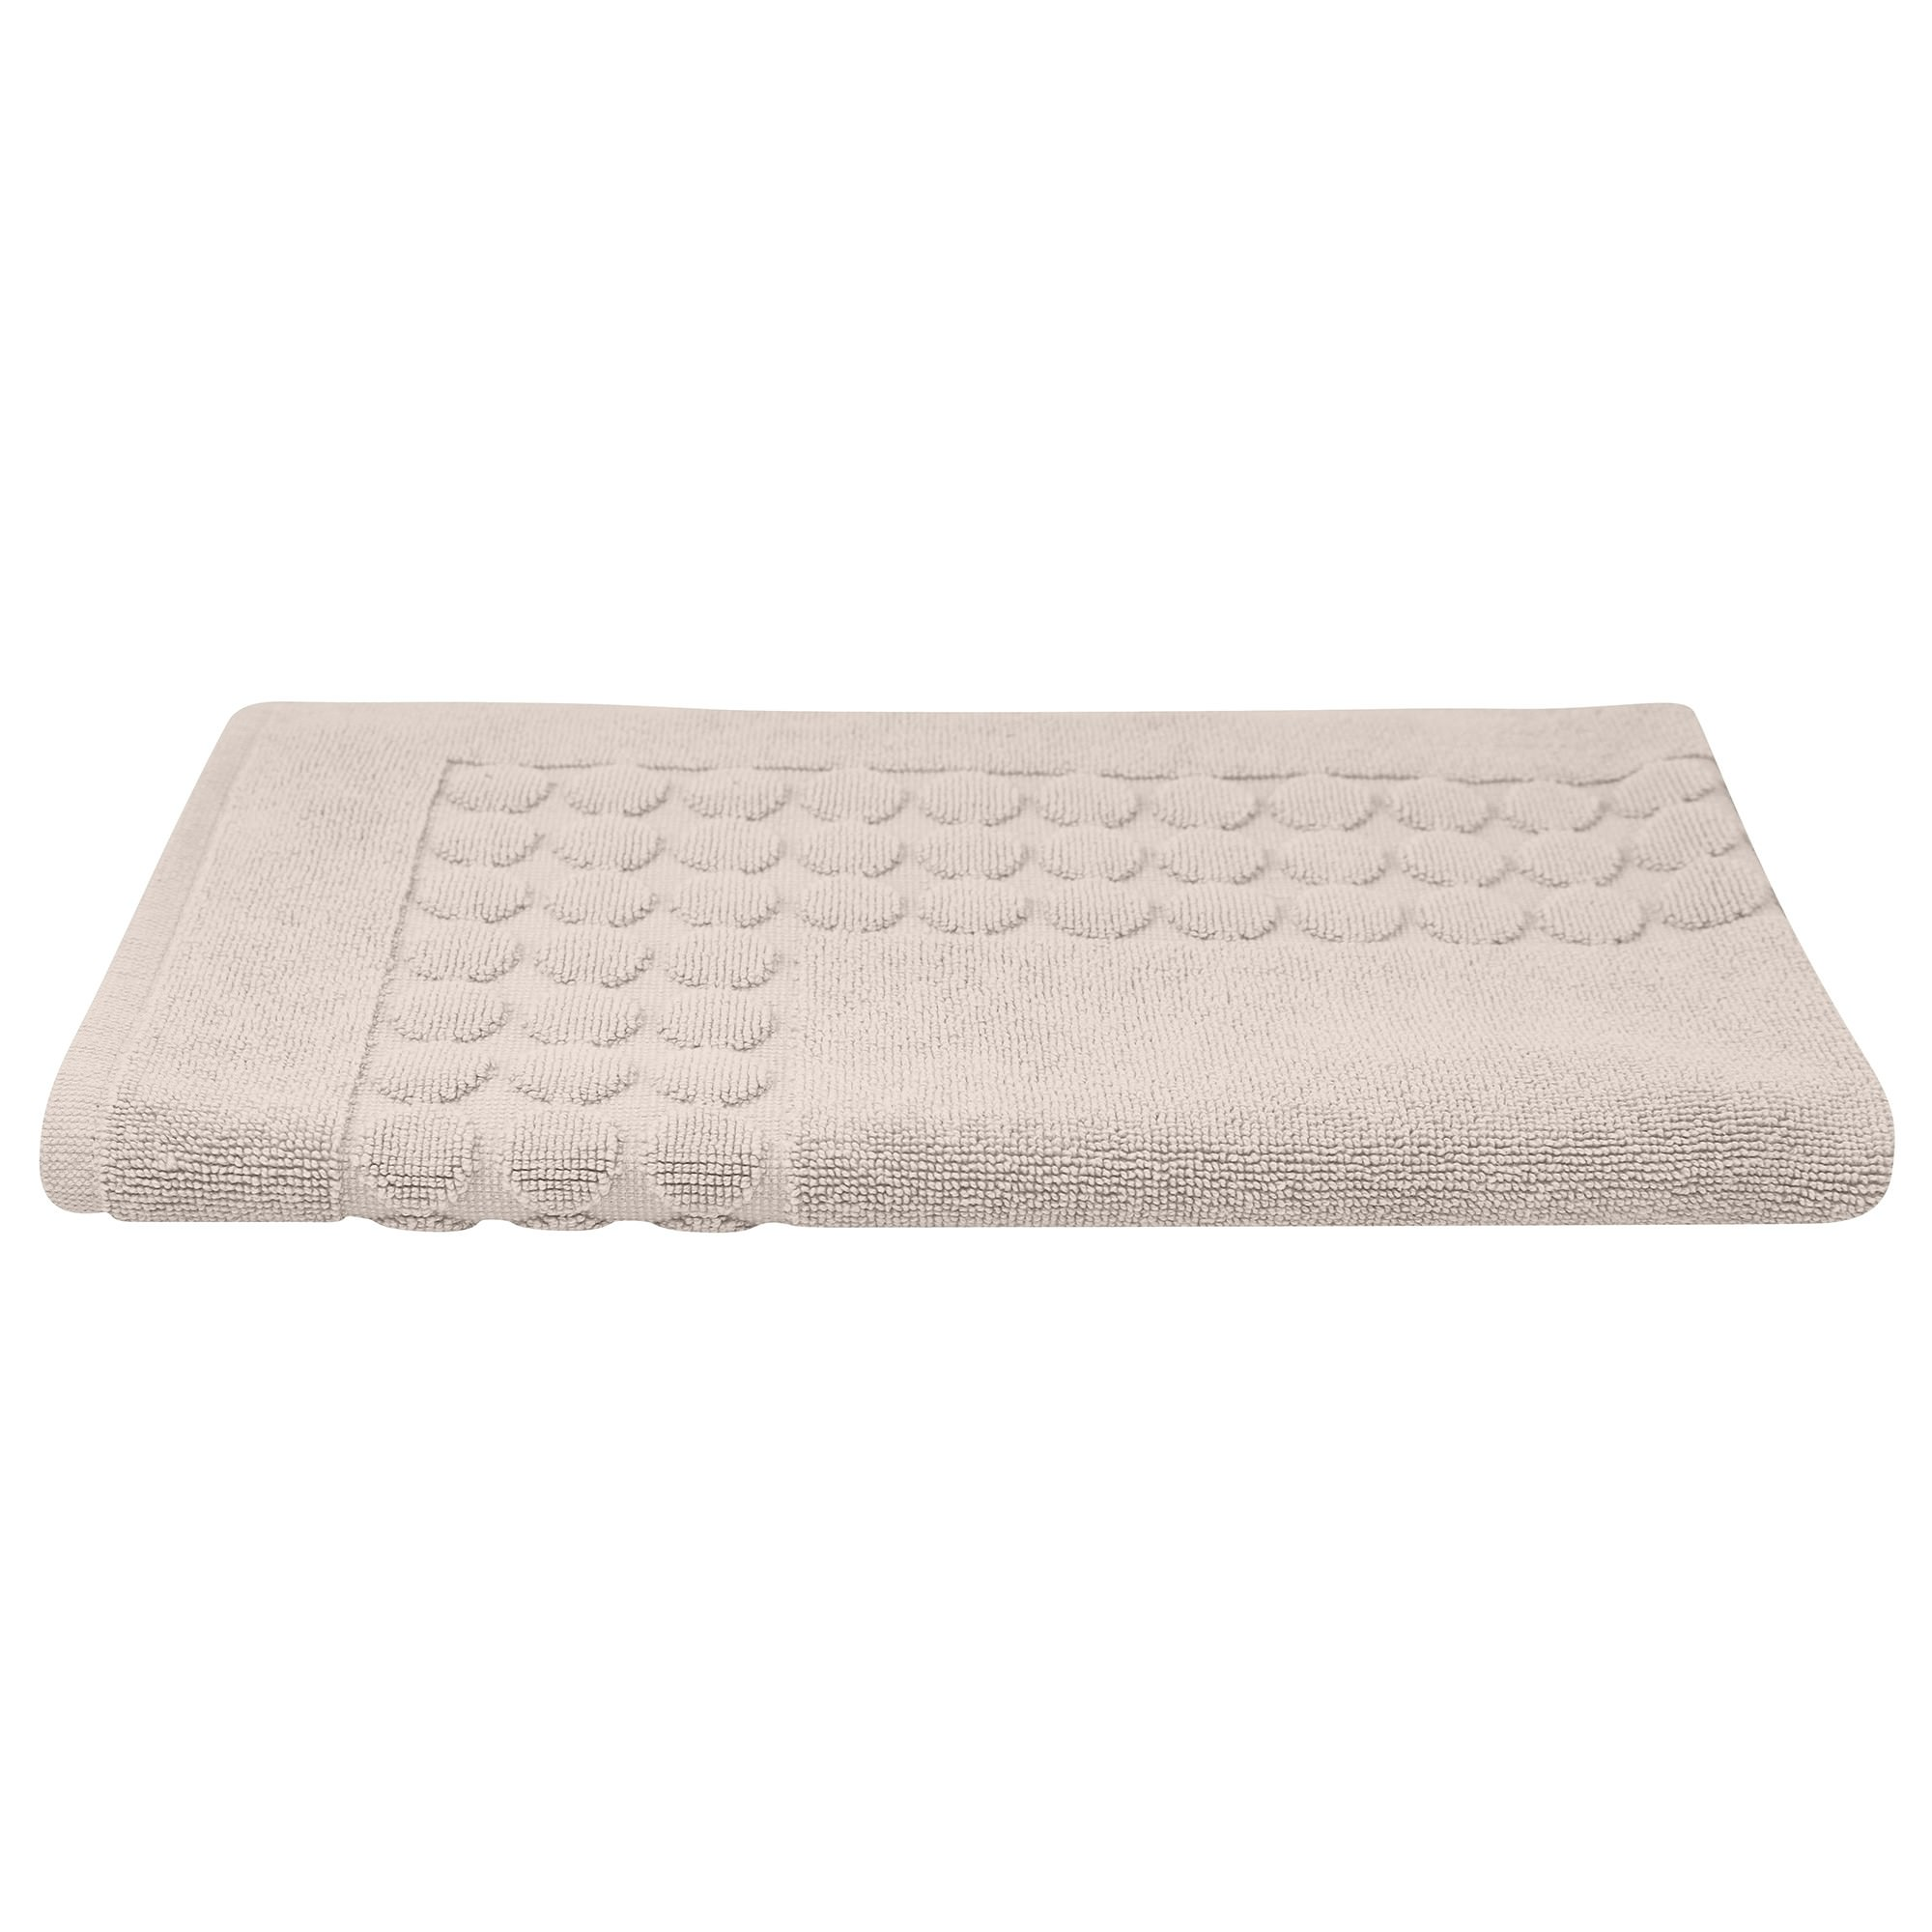 Odyssey Living Meridian Cotton Bath Mat, Sand